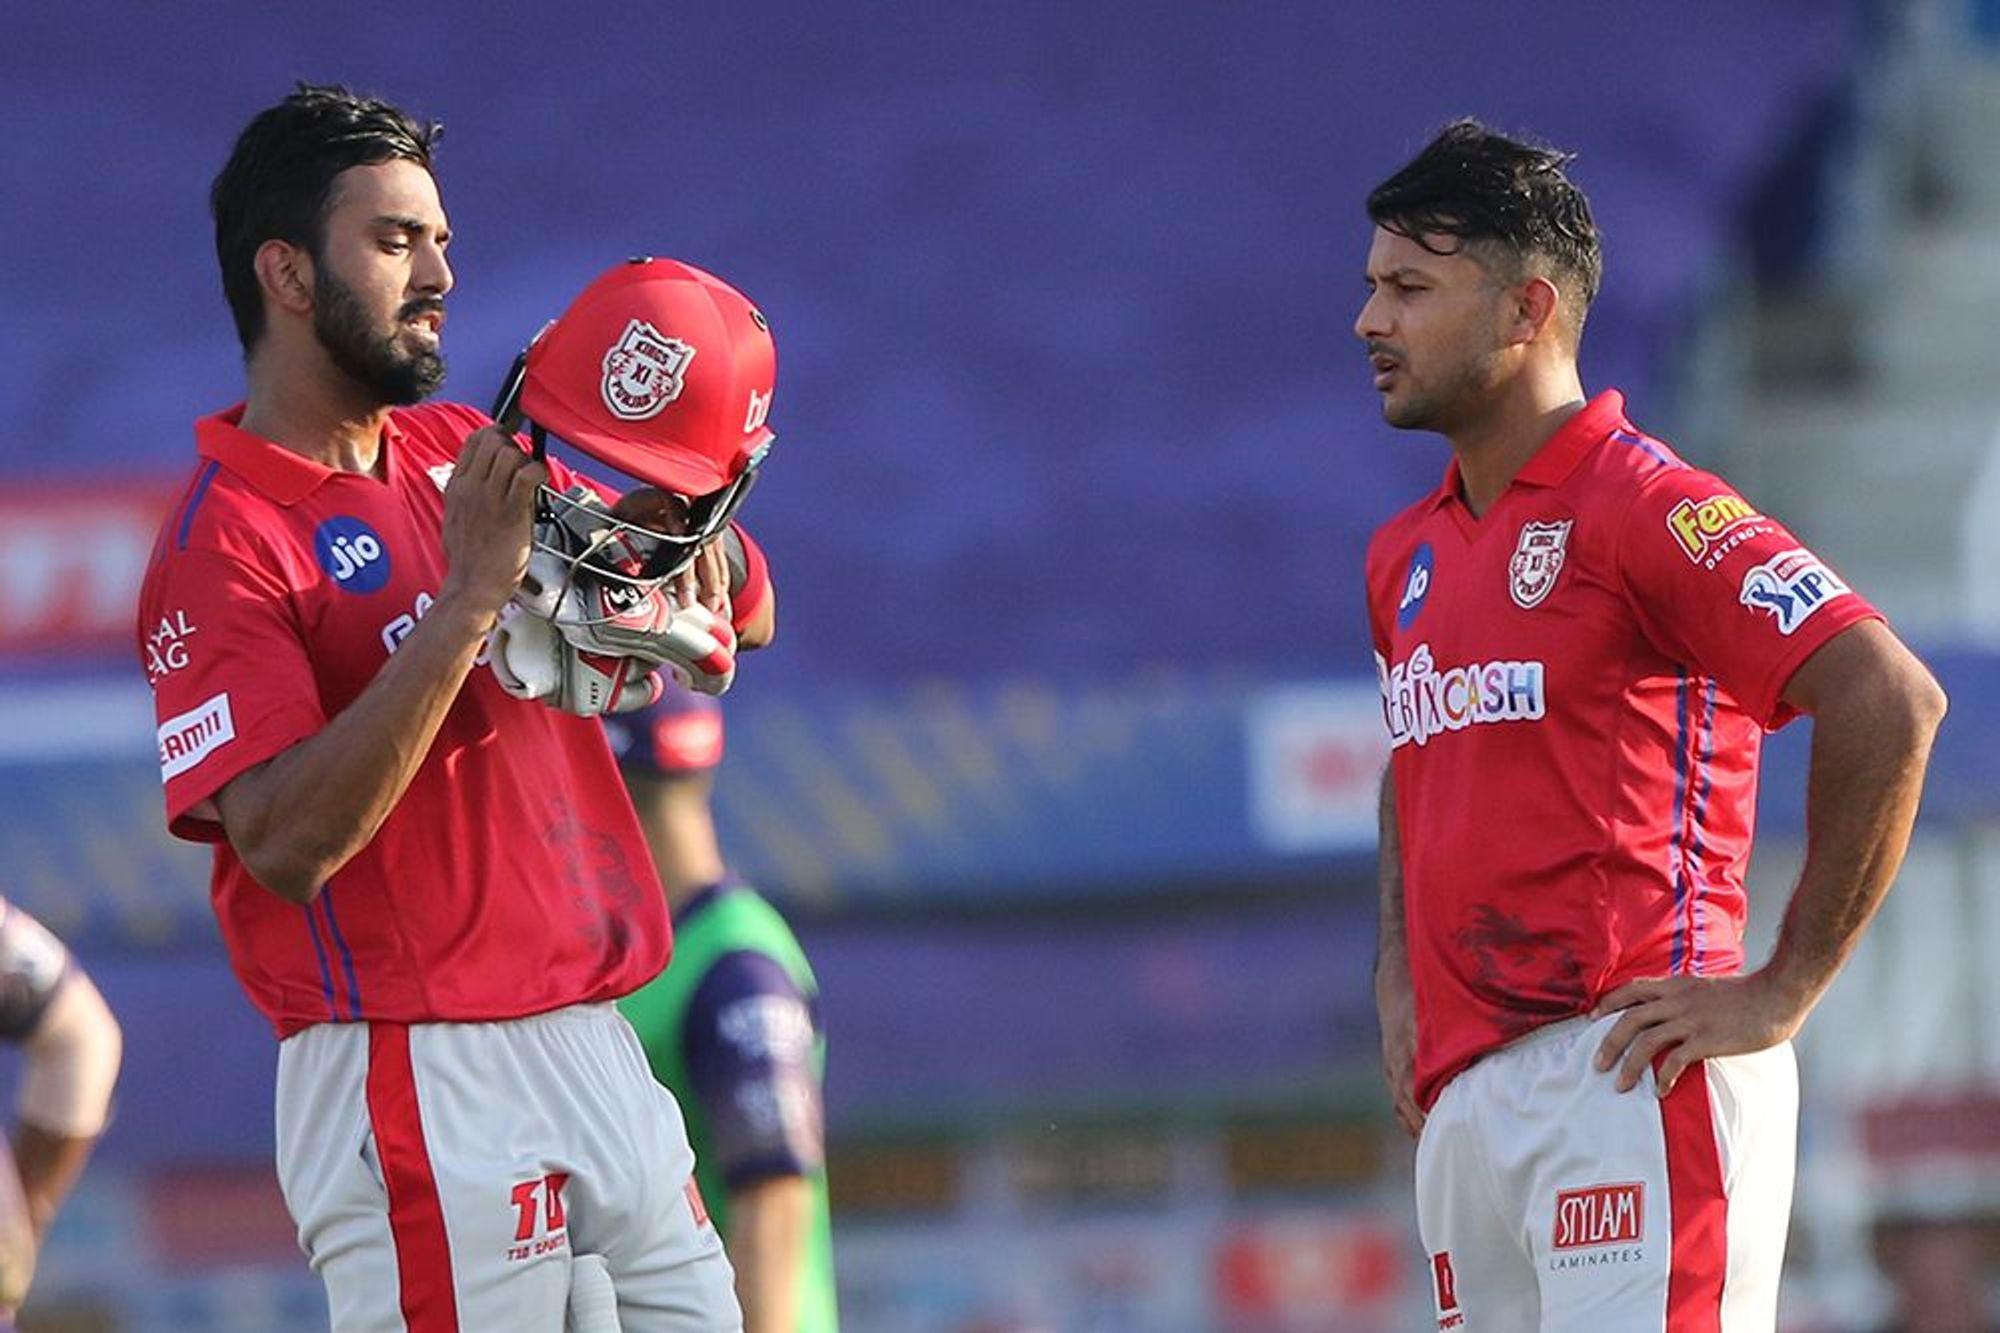 KL Rahul (670) and Mayank Agarwal (424) scored more than 1000 runs between them in this IPL. (Photo - BCCI / IPL)